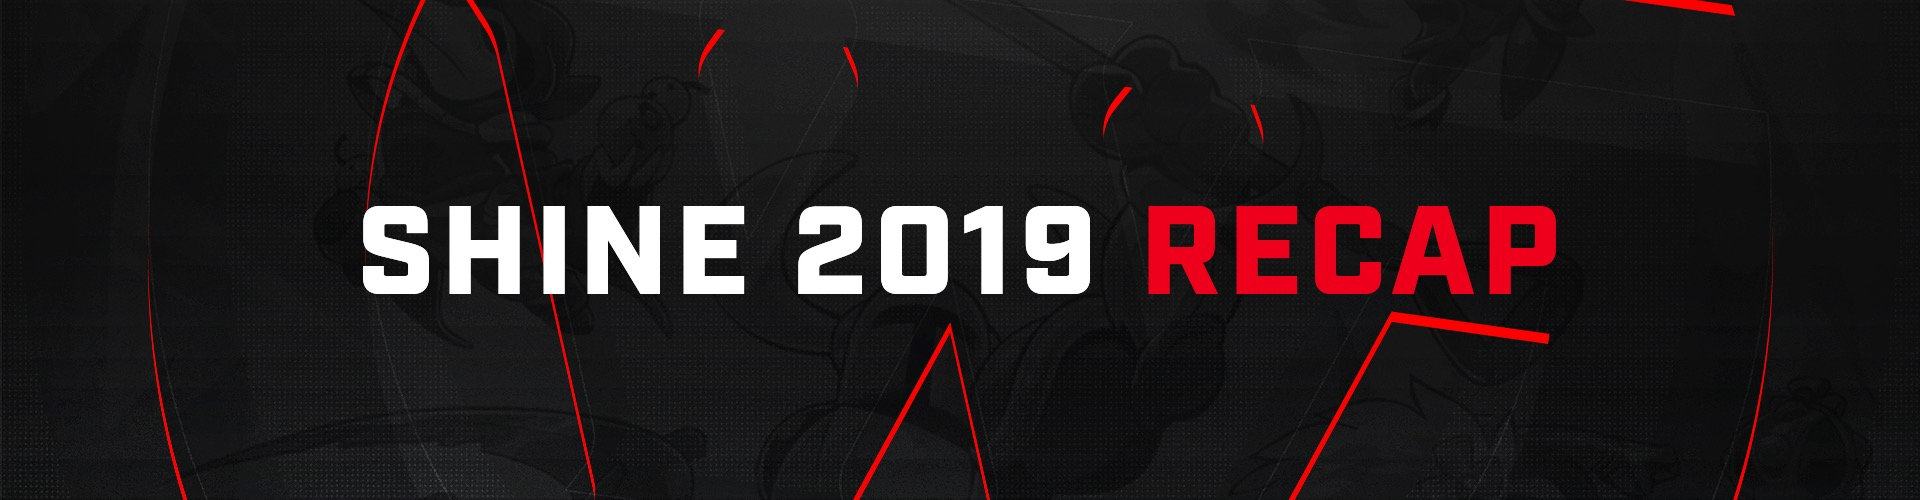 Shine 2019 Recap